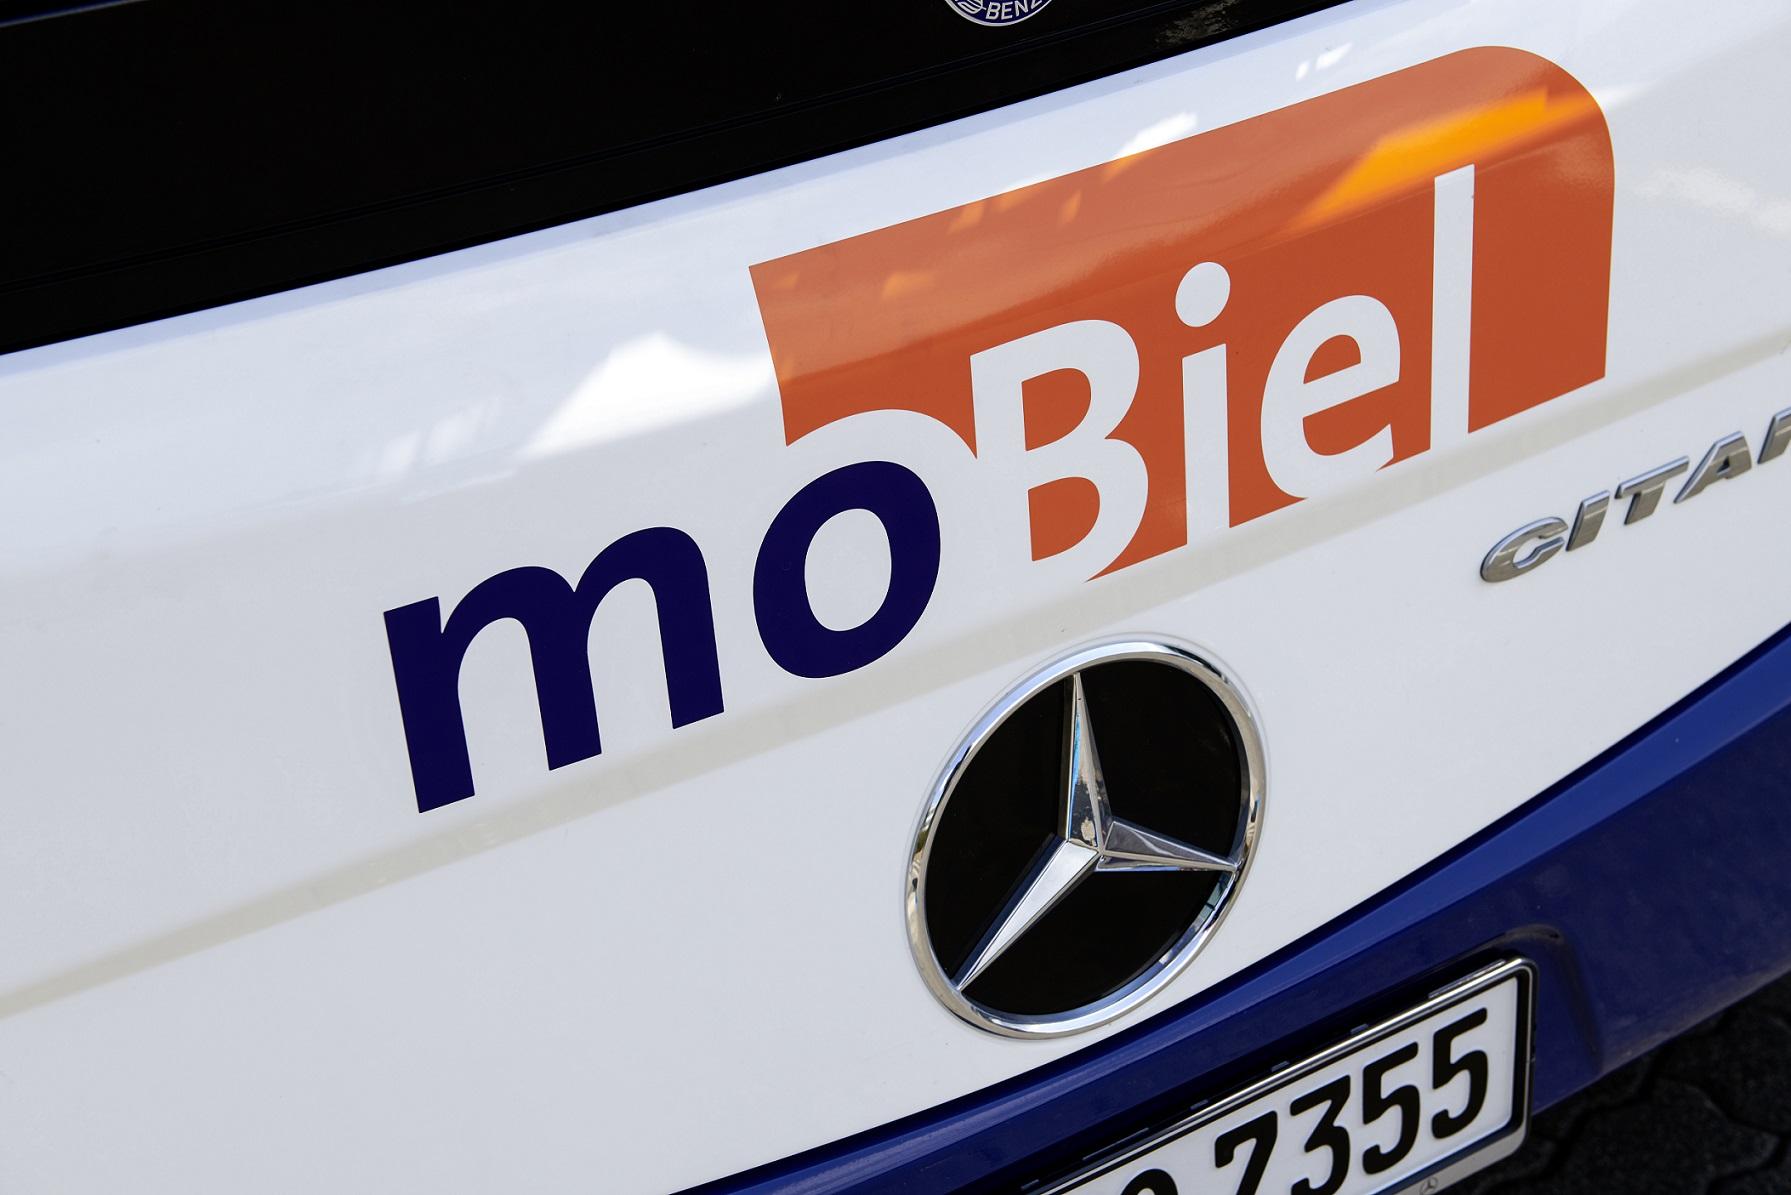 Mobilität In Bielefeld Mobiel